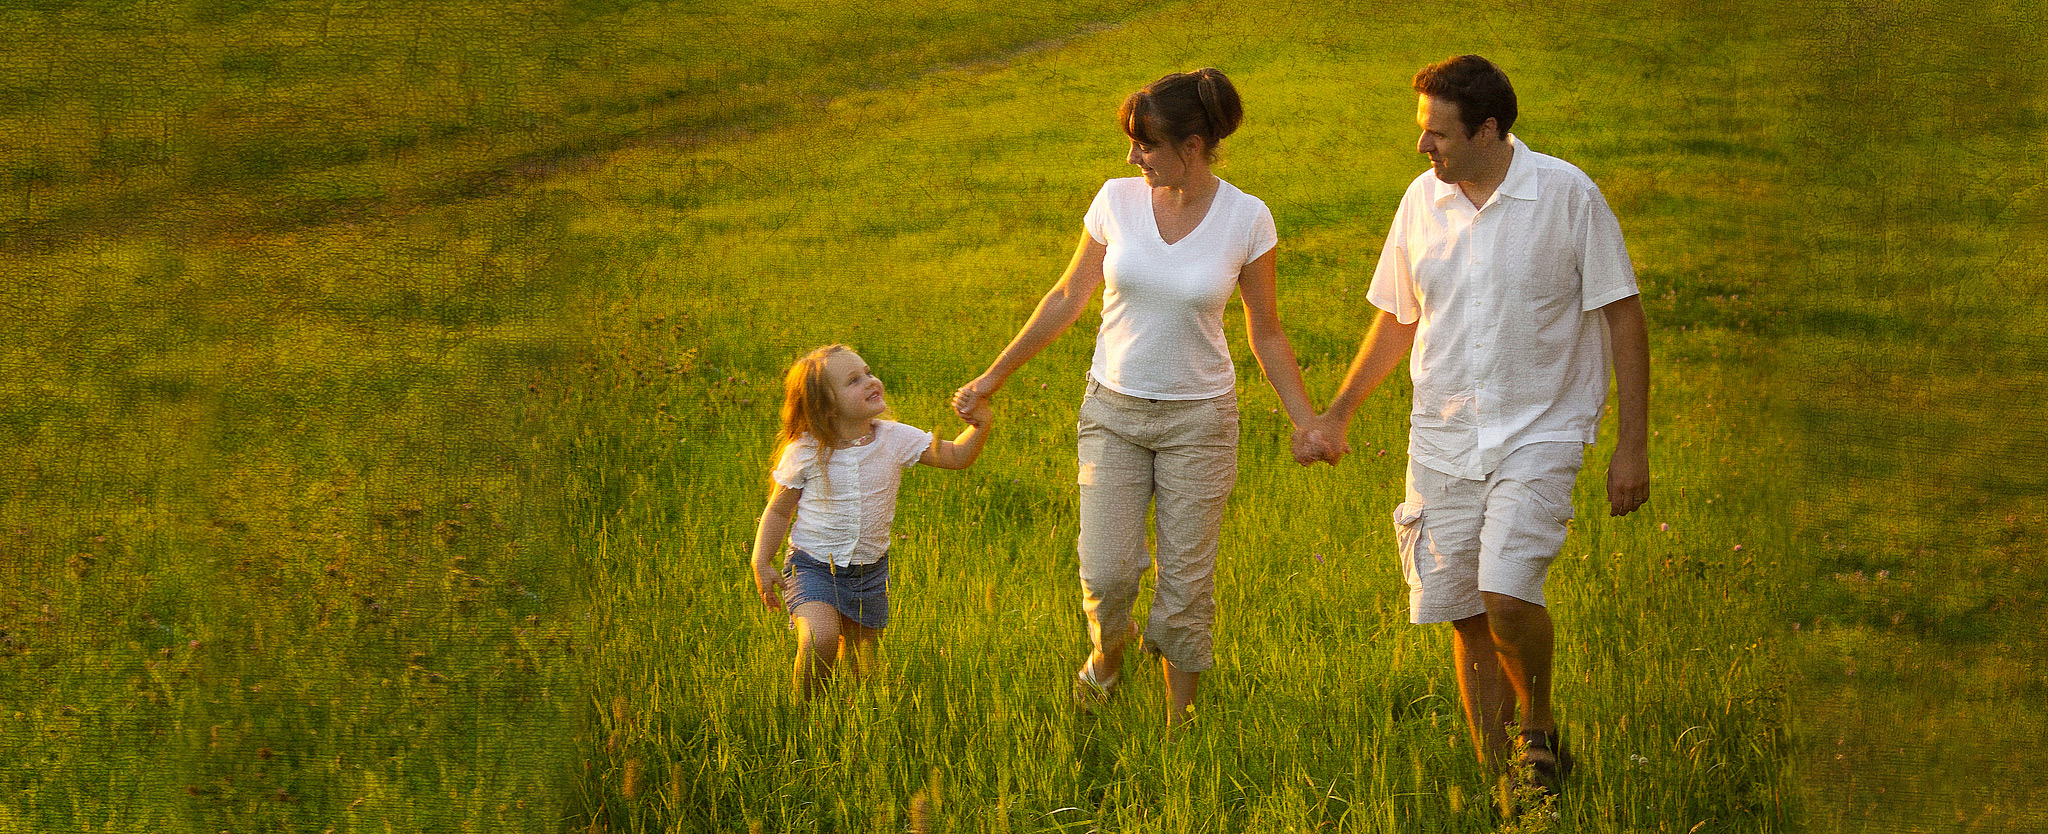 photographe-famille-rigaud-stephane-lariviere-photo-photographie